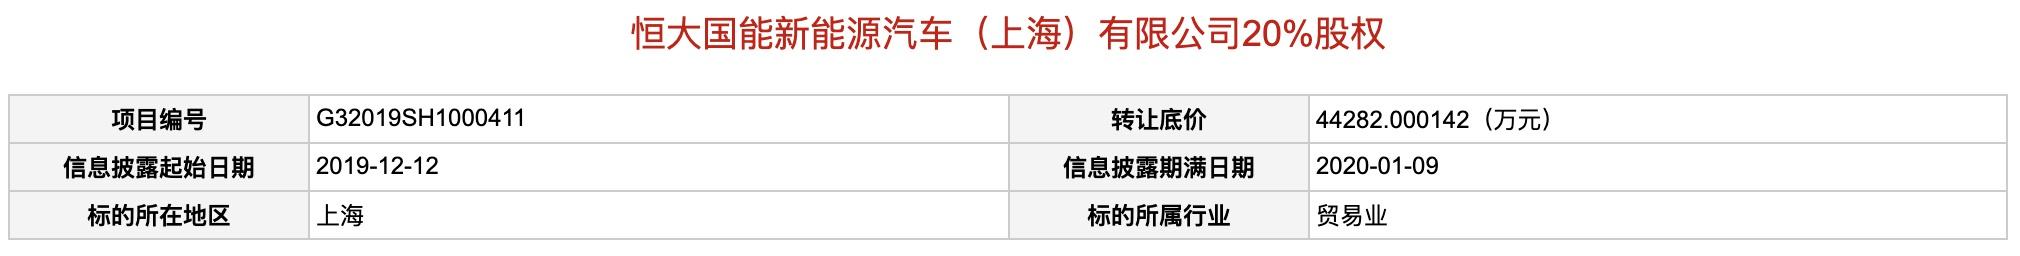 http://www.zgcg360.com/huagongnenyuan/548113.html